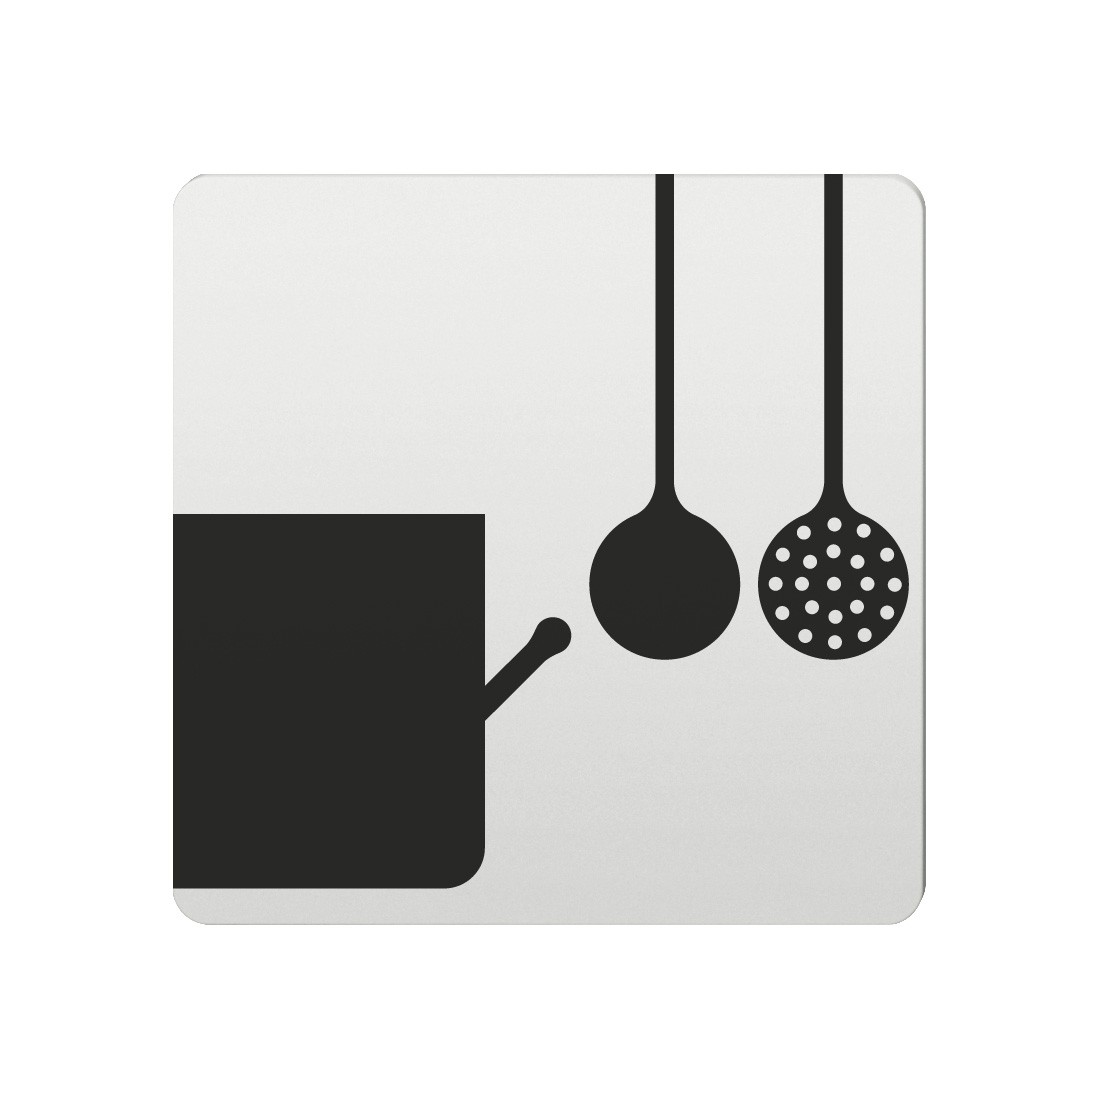 FSB Hinweiszeichen Kueche Lasergraviert Aluminium naturfarbig (0 36 4059 00150 0105)